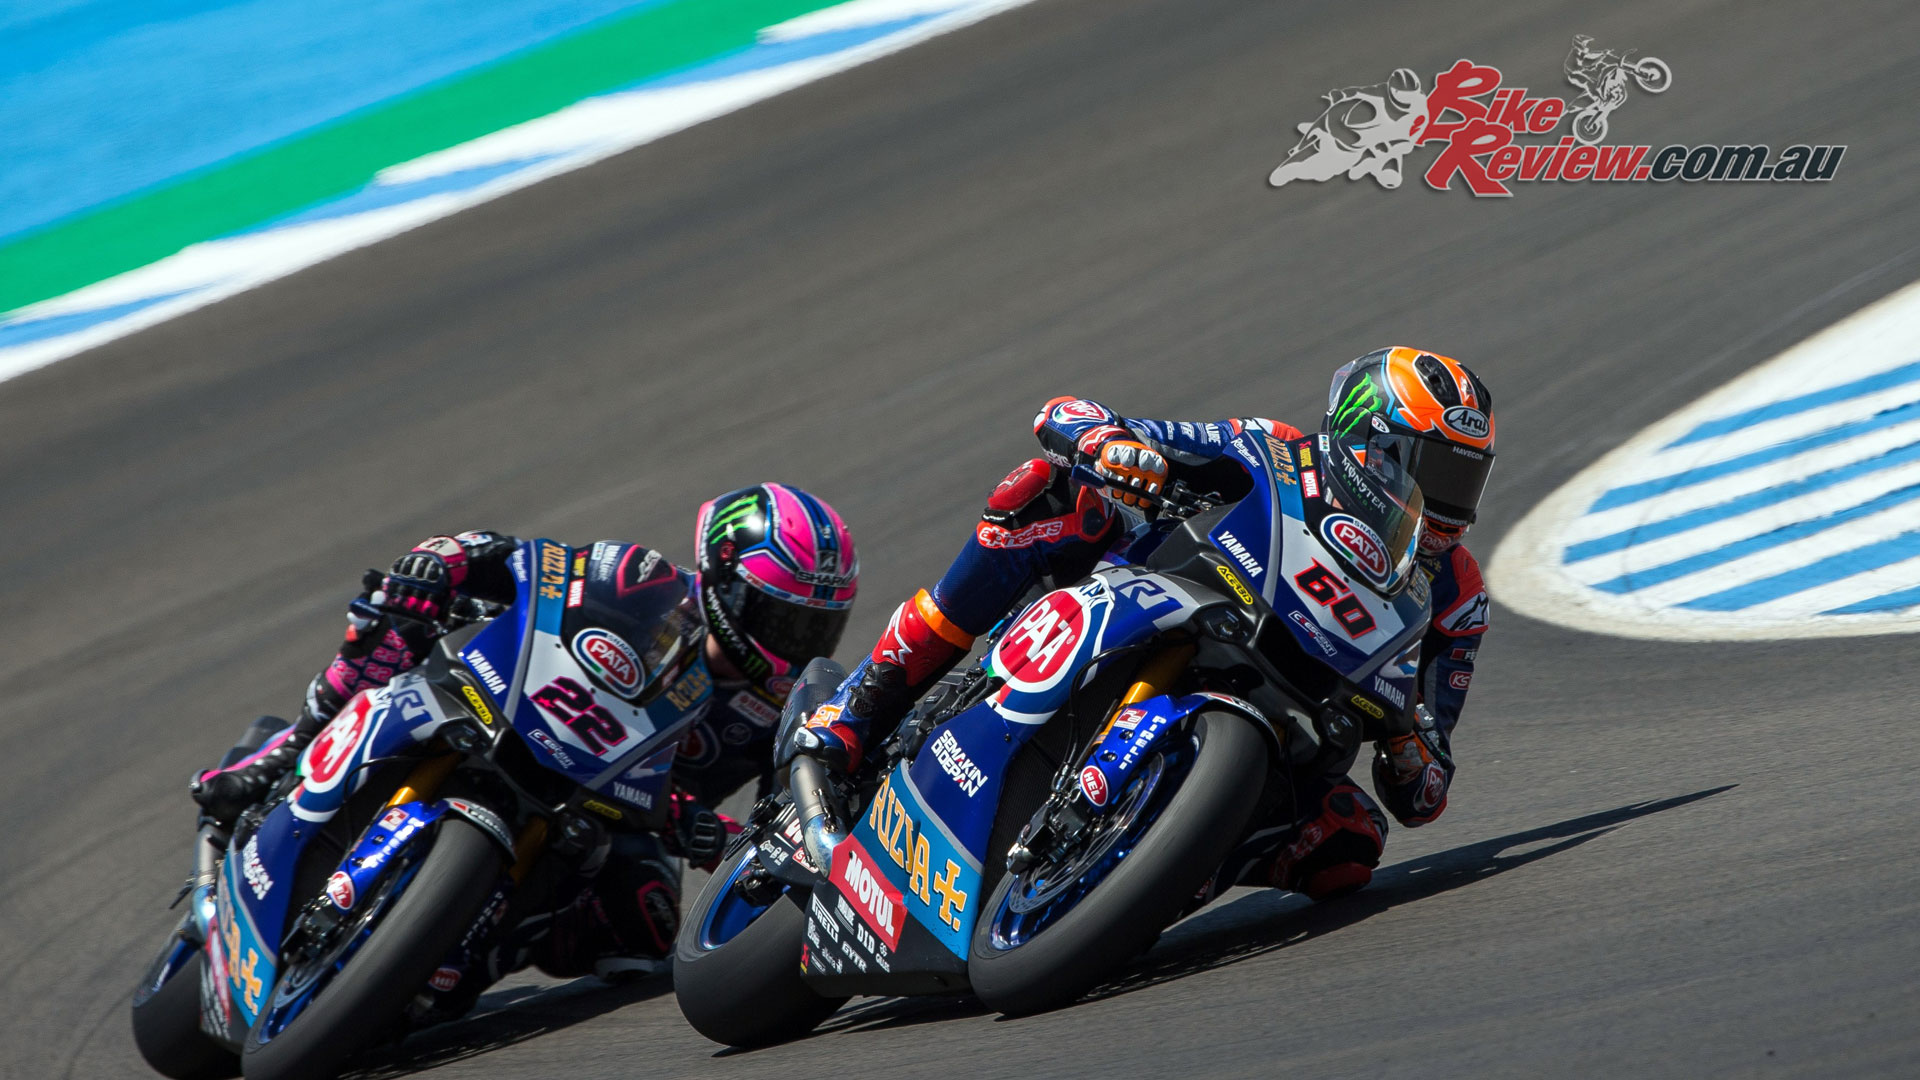 Michael van der Mark - Jerez WSBK 2019